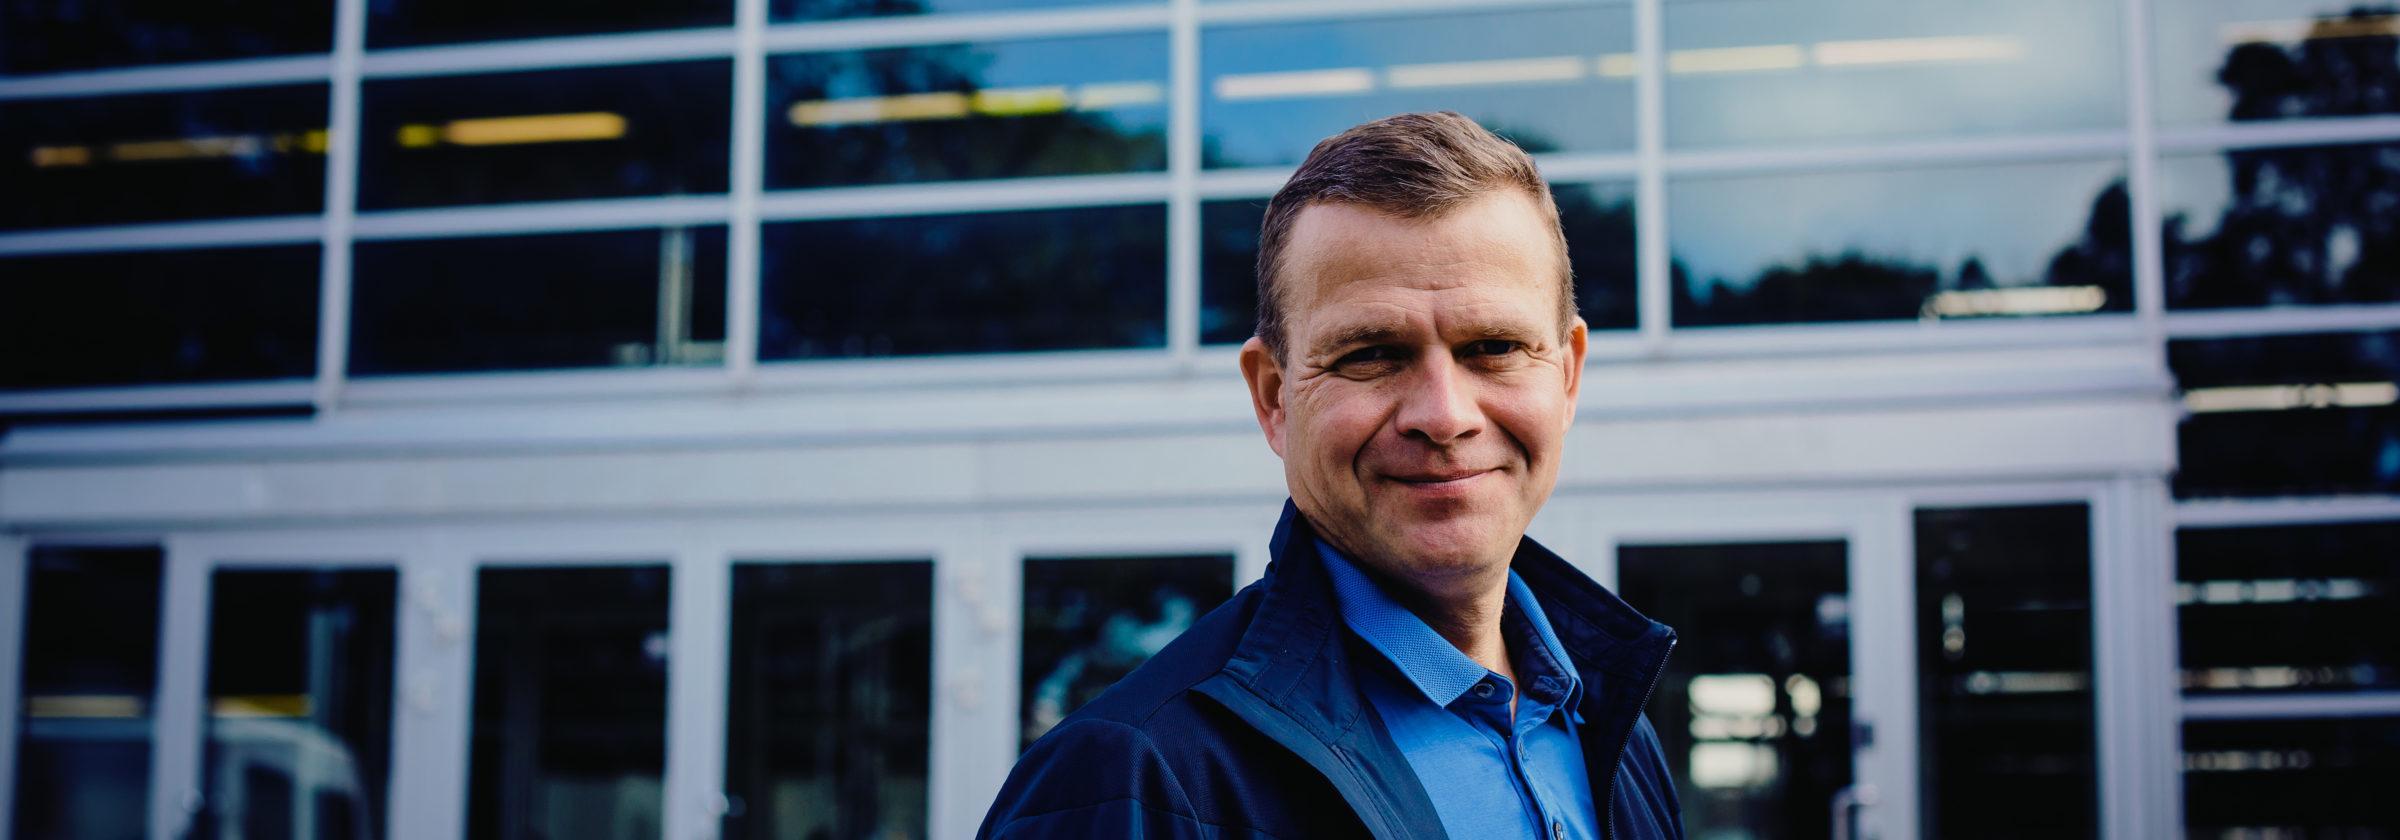 Kansanedustaja Petteri Orpo